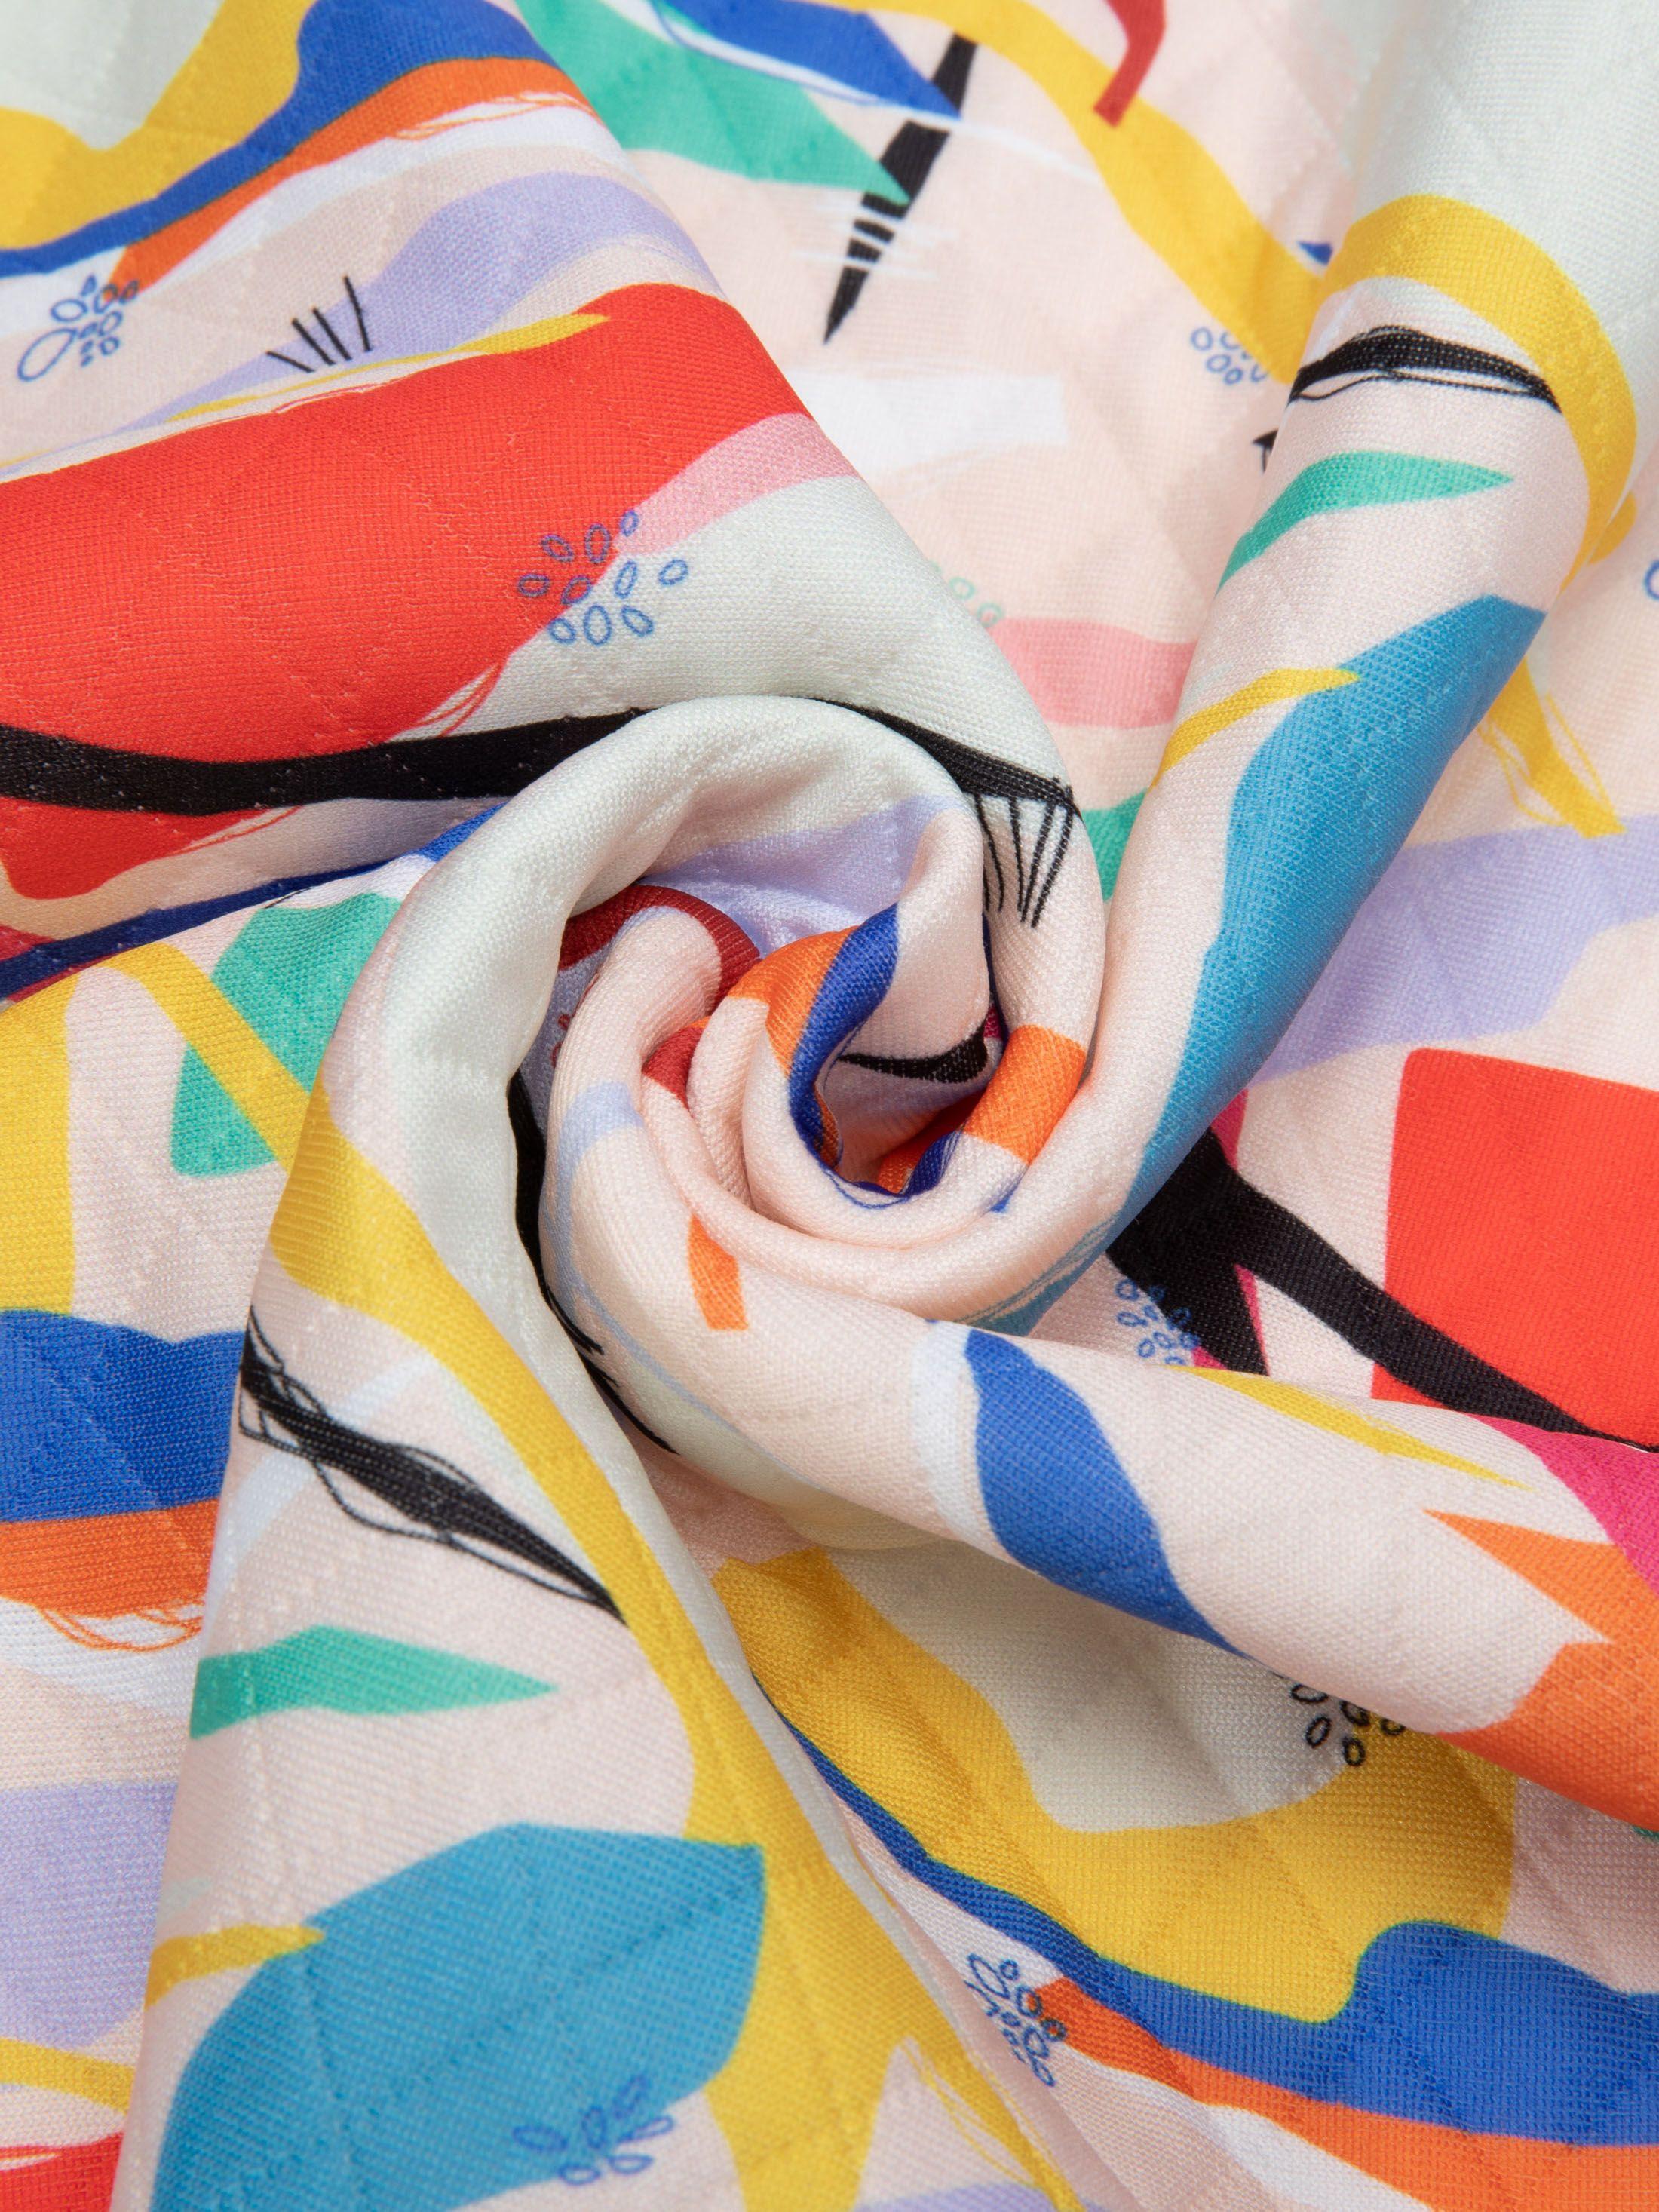 tejido acolchado impreso a medida